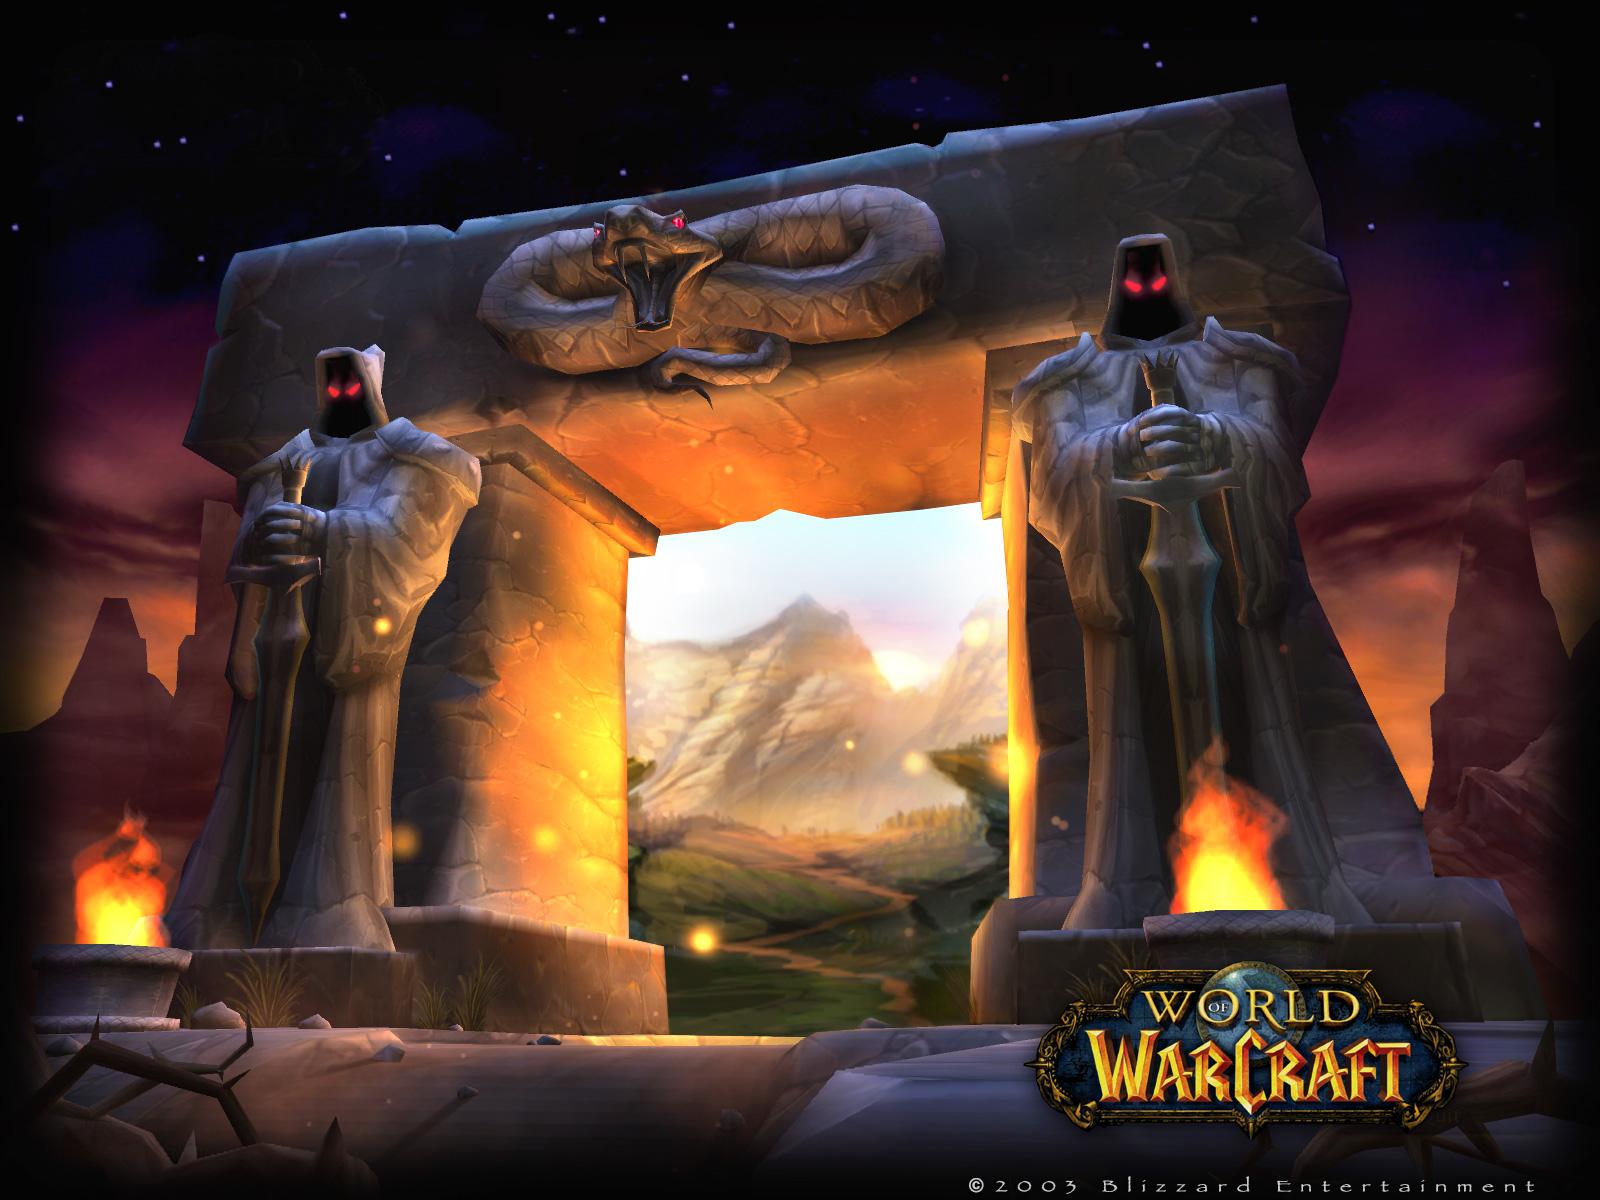 World Of Warcraft The Dark Portal Uhd 4k Wallpaper: Best Desktop HD Wallpapers: World Of